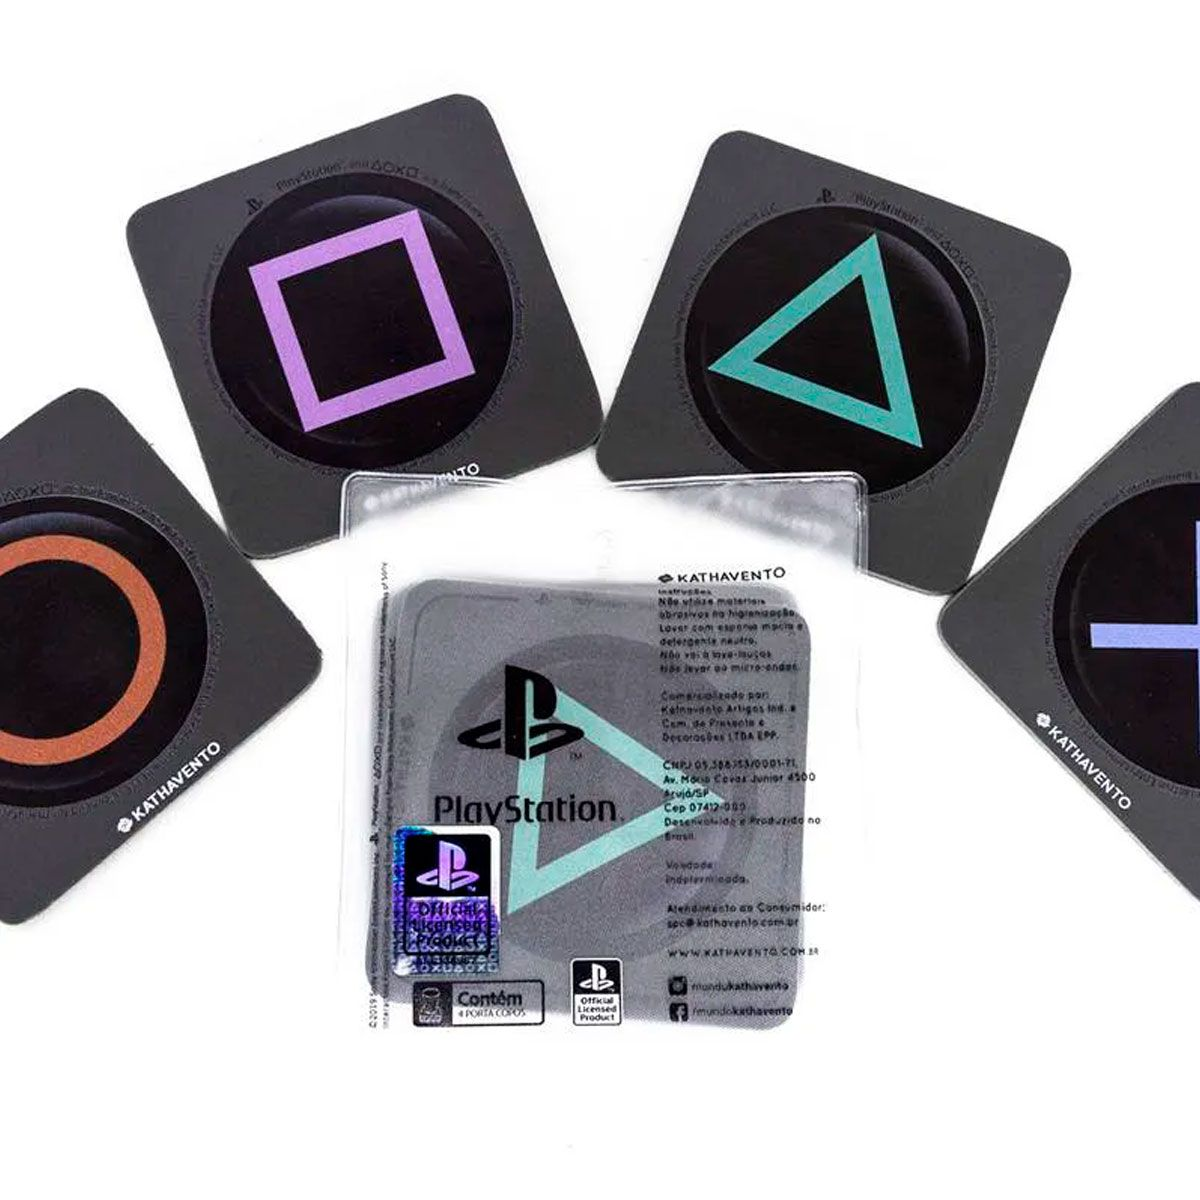 Porta Copos com 4 Unidades Playstation